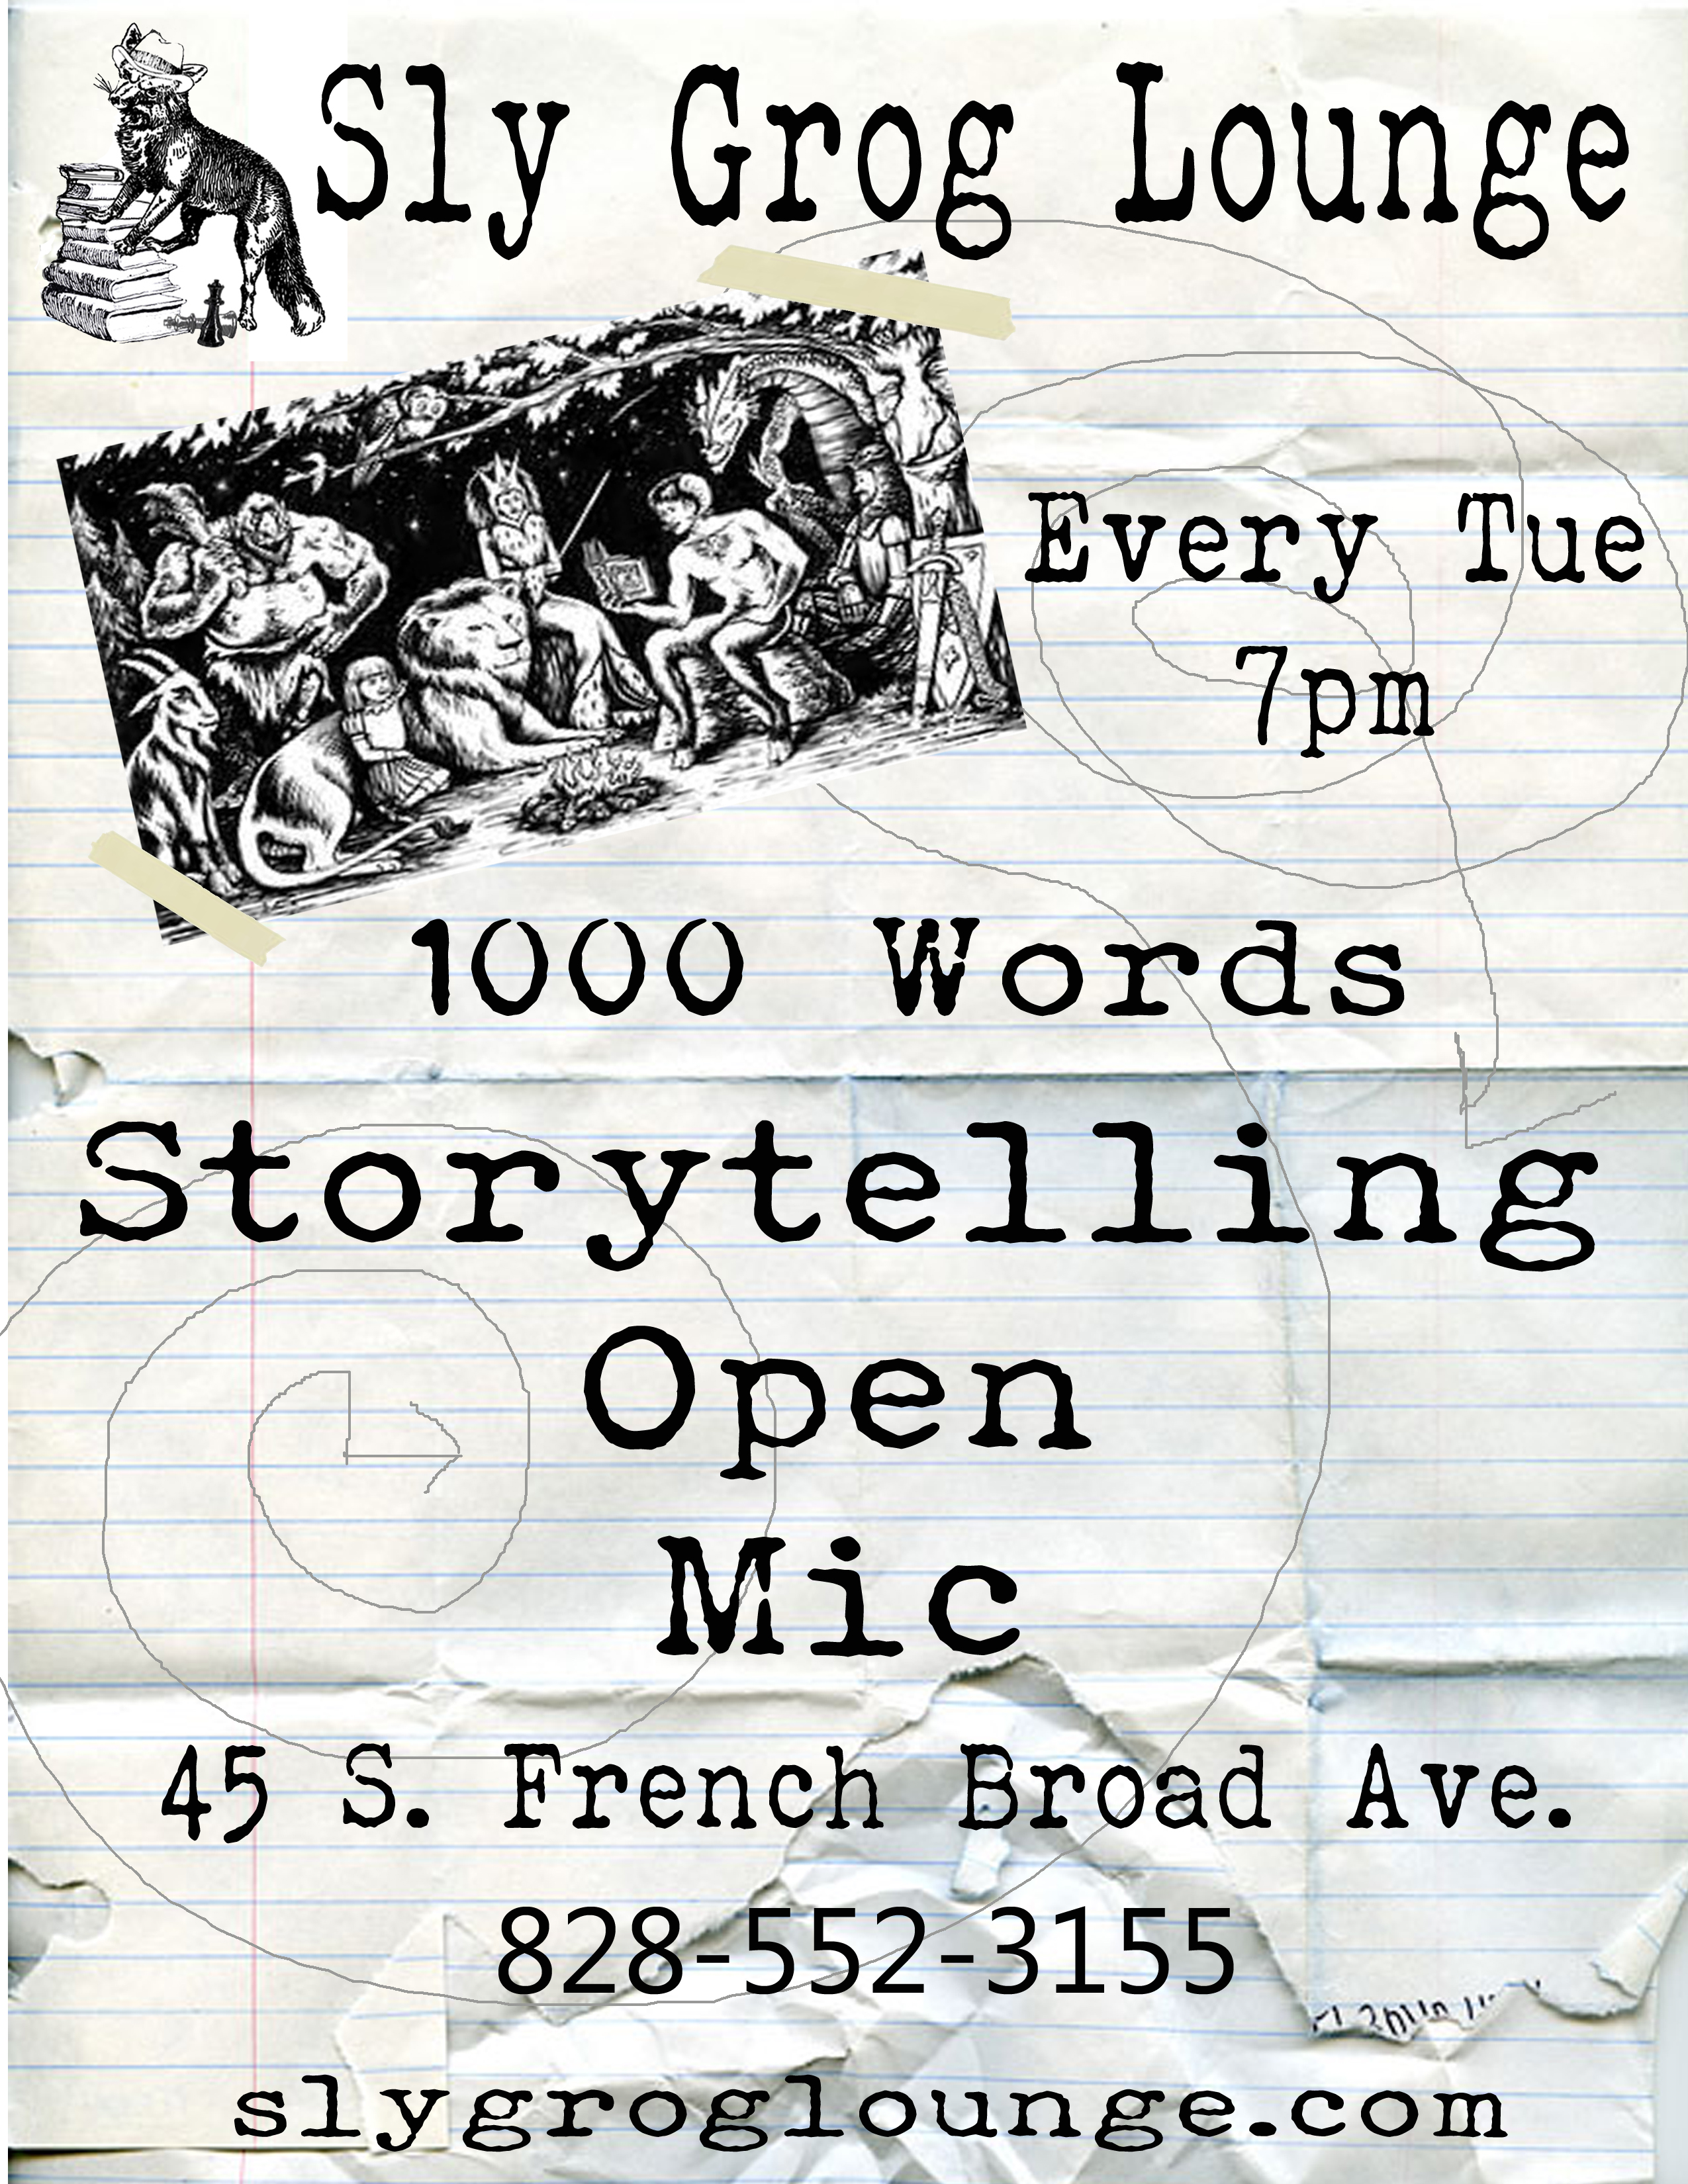 Story teller open mic copy